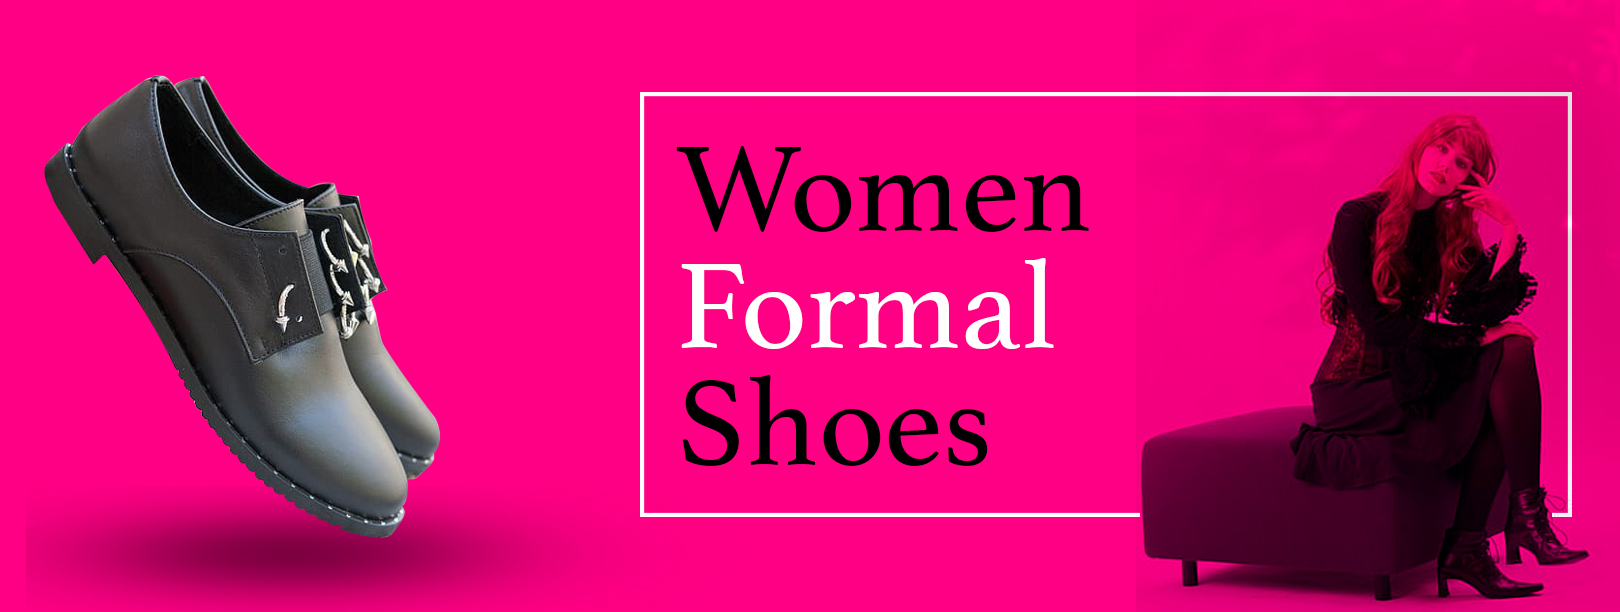 Flipkart Women Formal Shoes